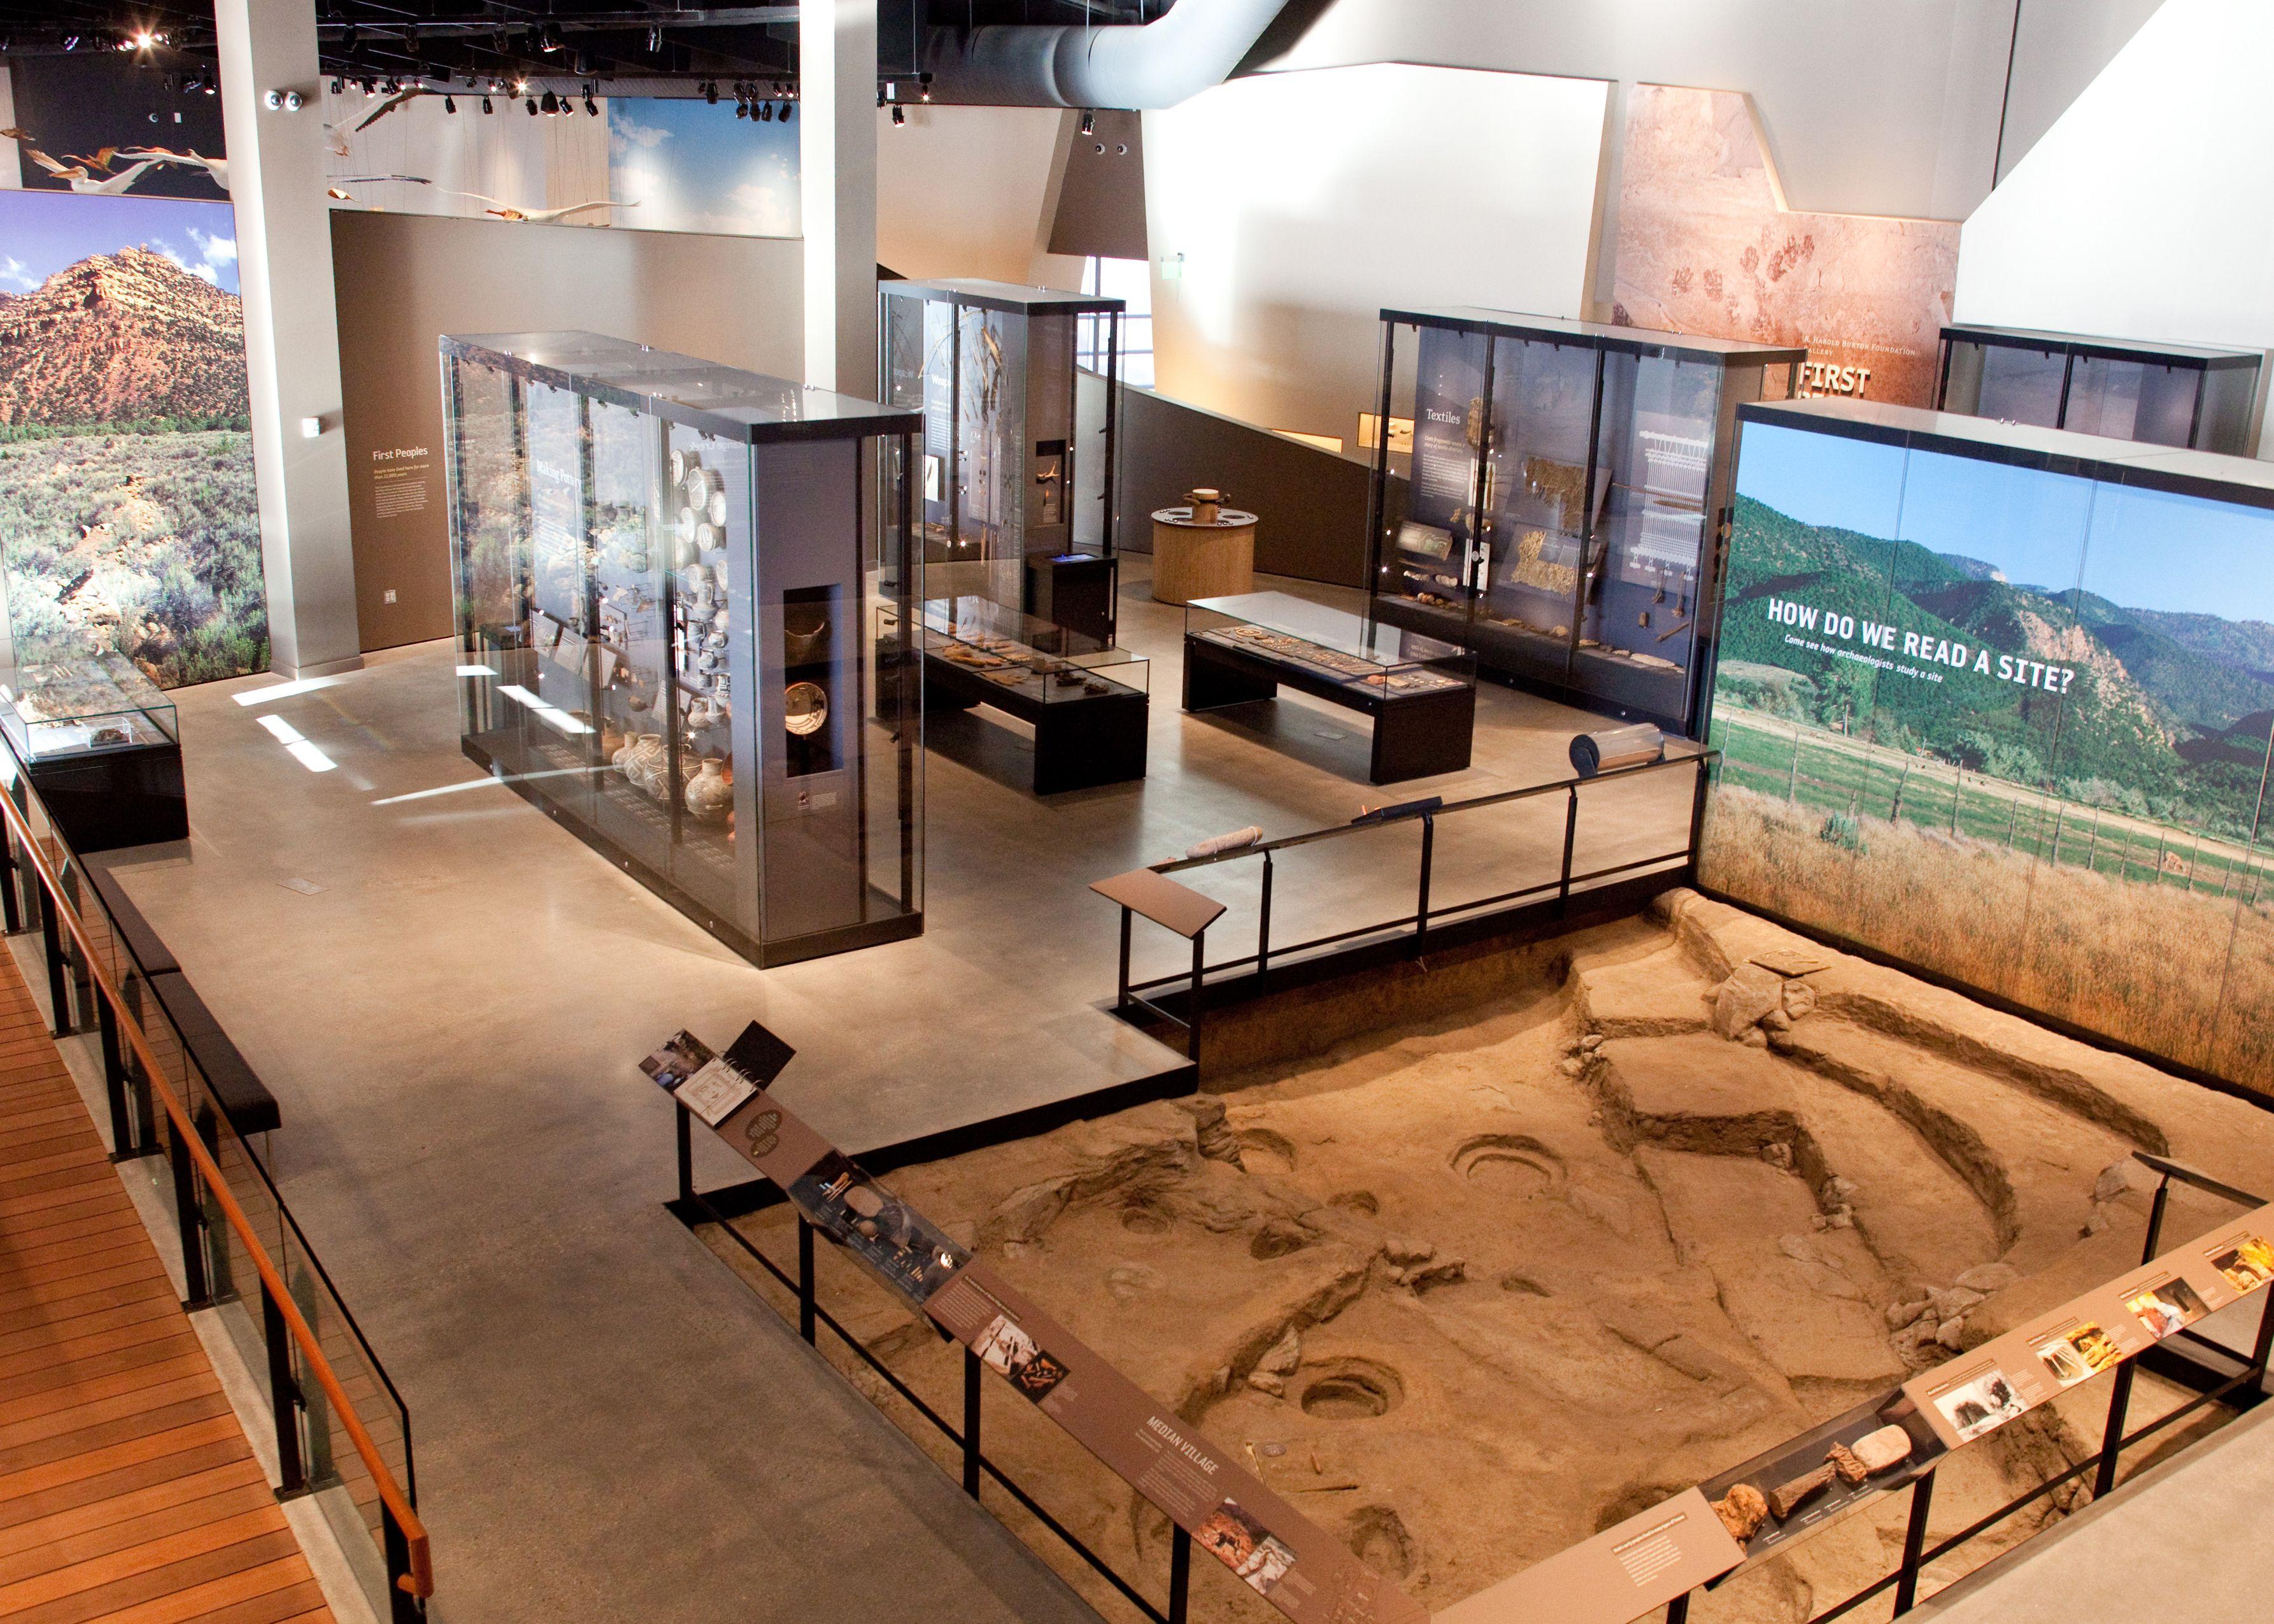 Natural history museum of utah in salt lake city photograph by